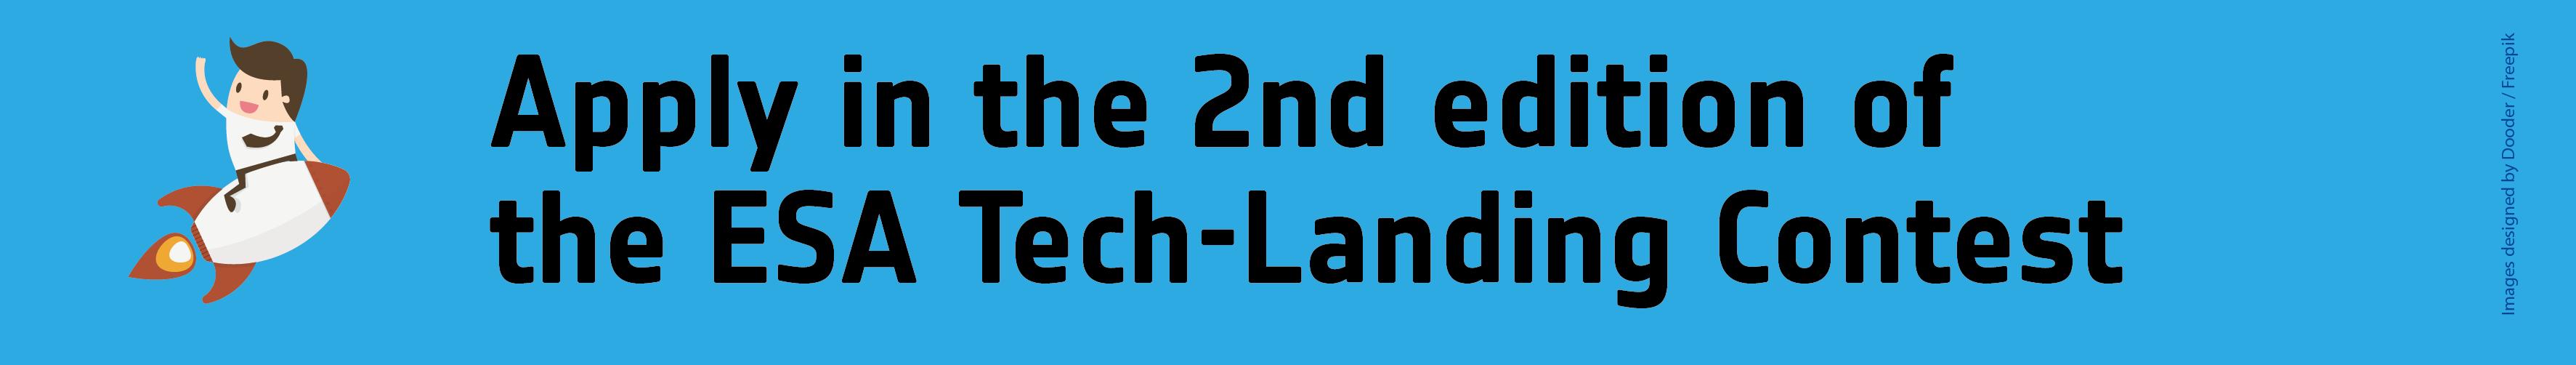 ESA Tech-Landing